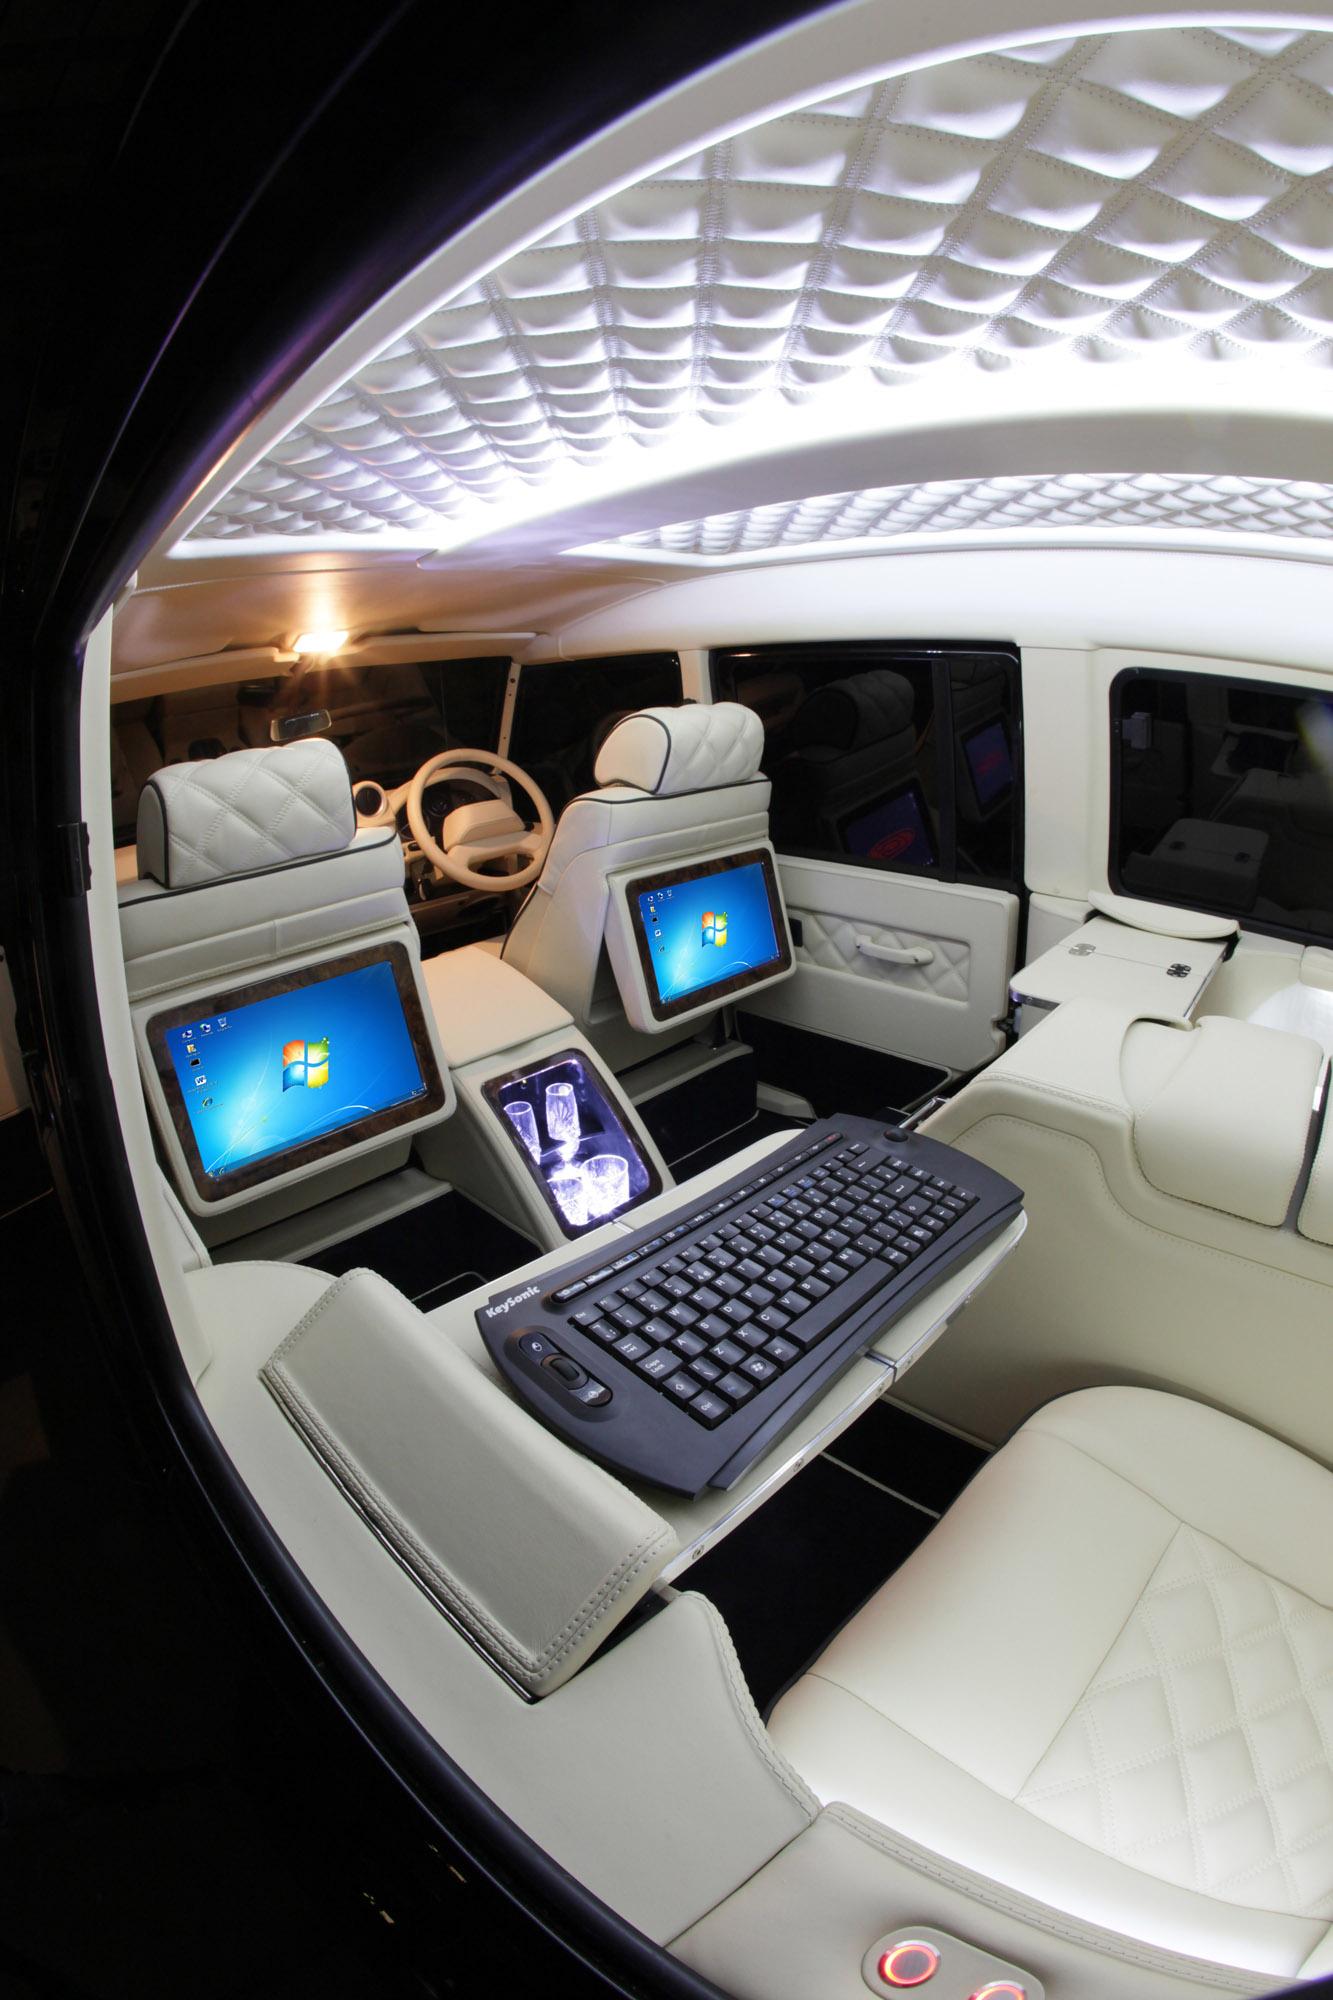 Carisma Auto Design Land Rover Defender Interior - Picture 86827